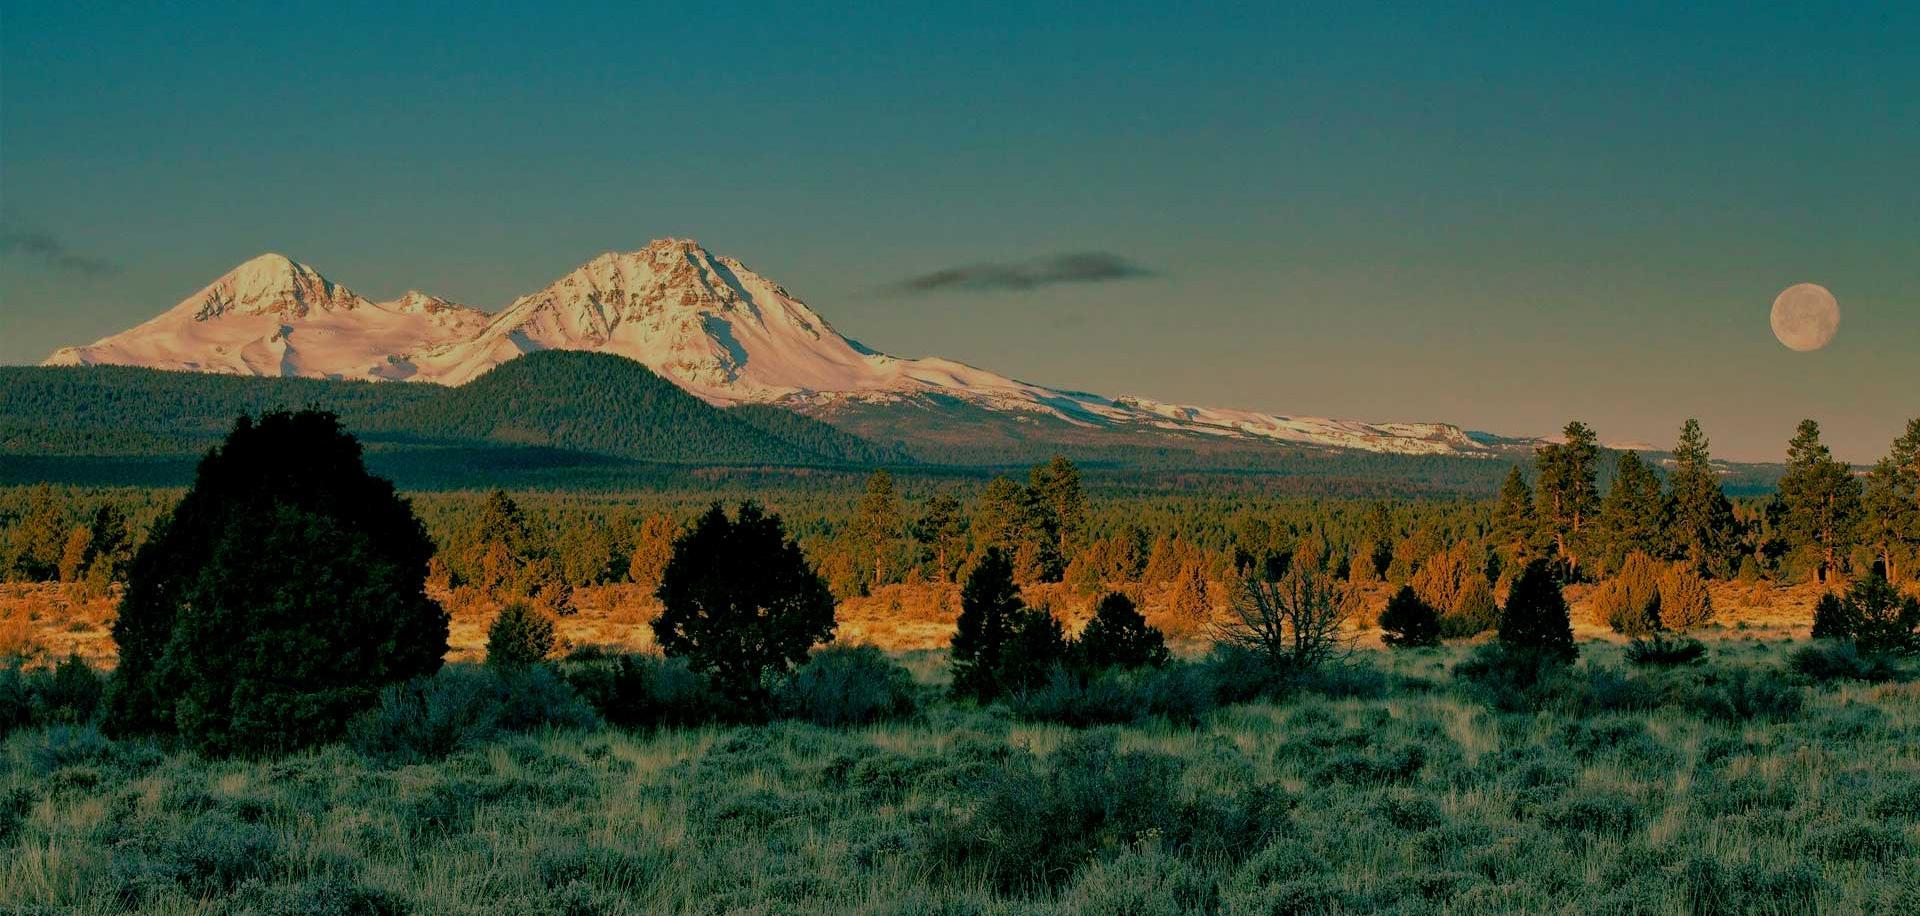 Home - Economic Development for Central Oregon